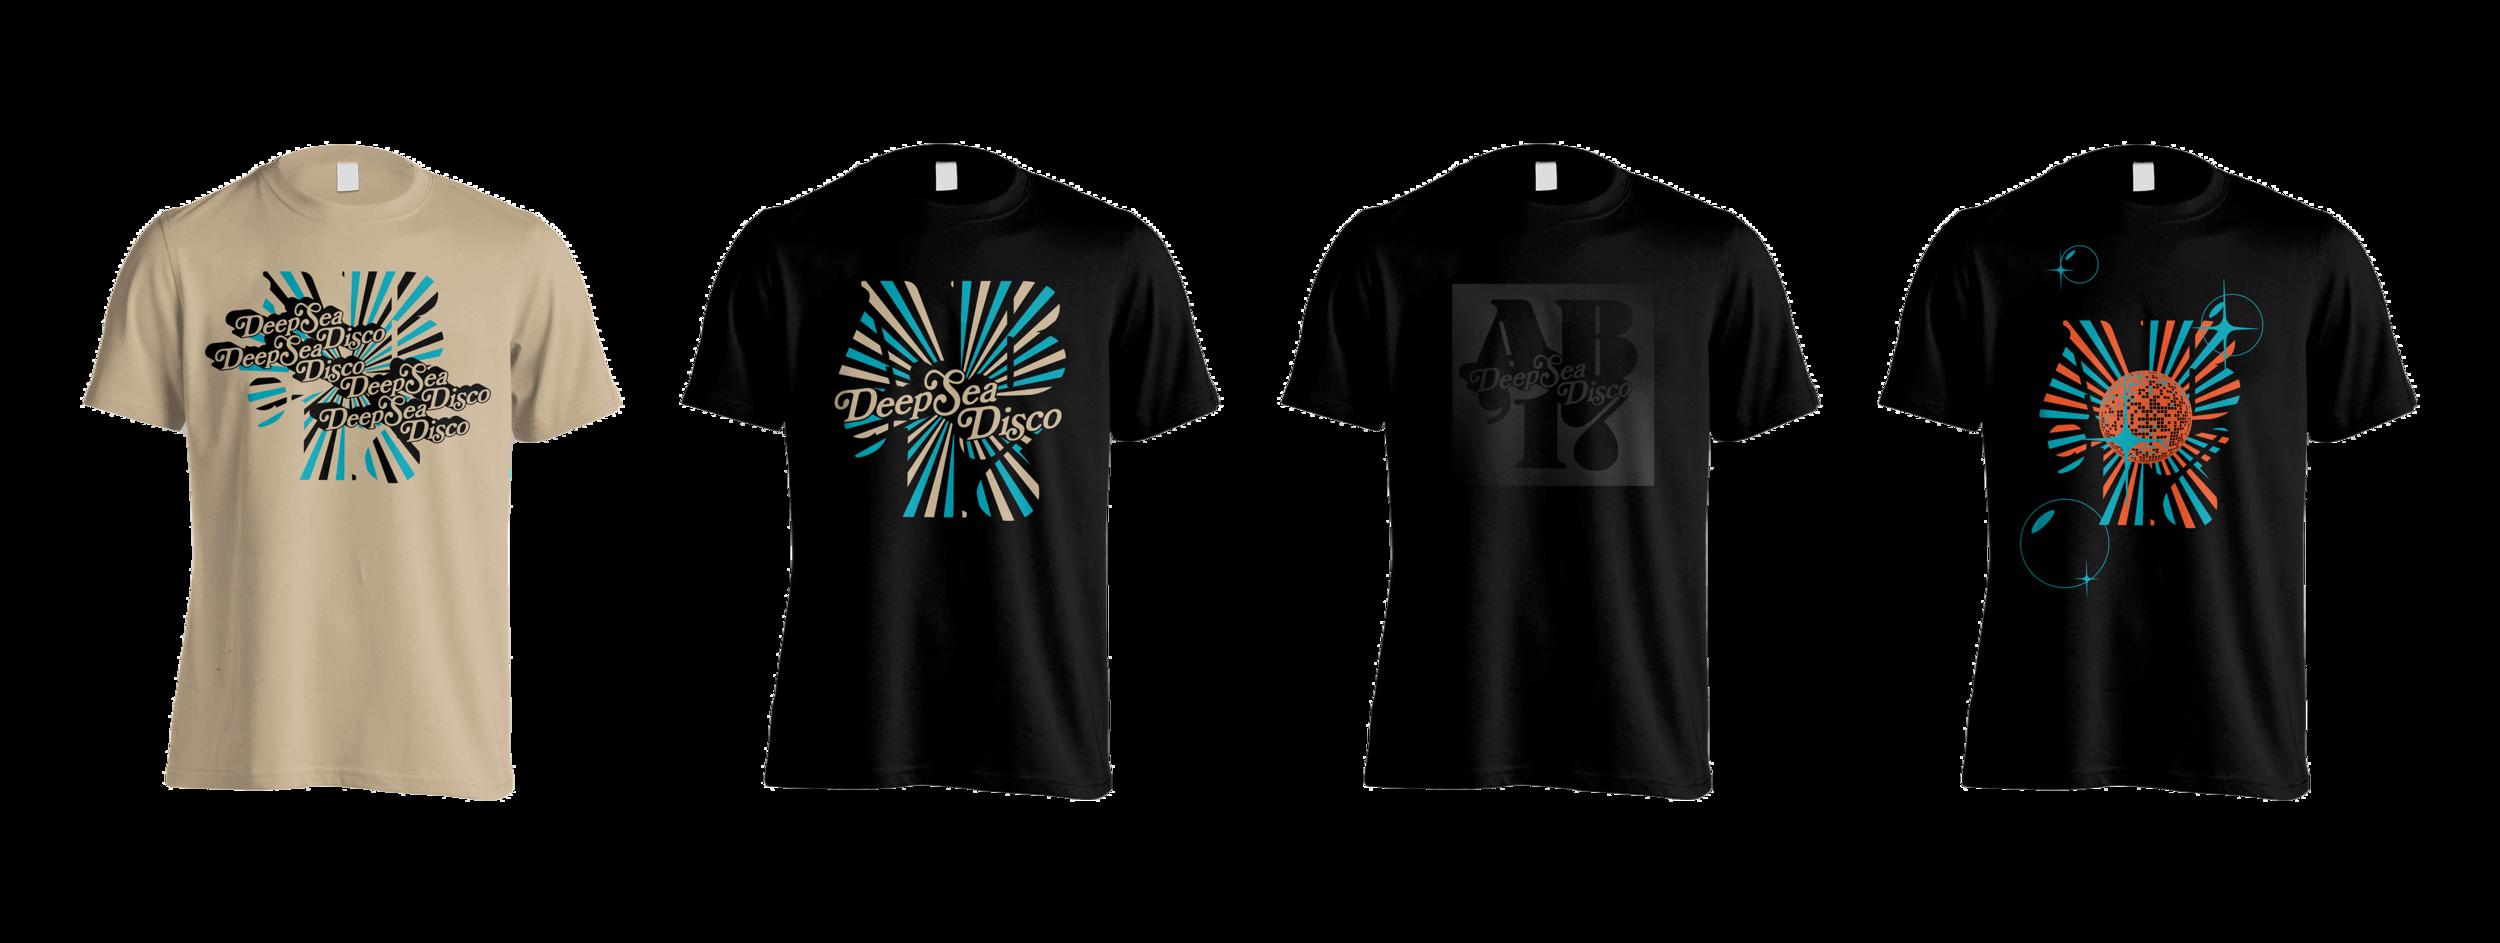 T-Shirts designed by Julian Kelly